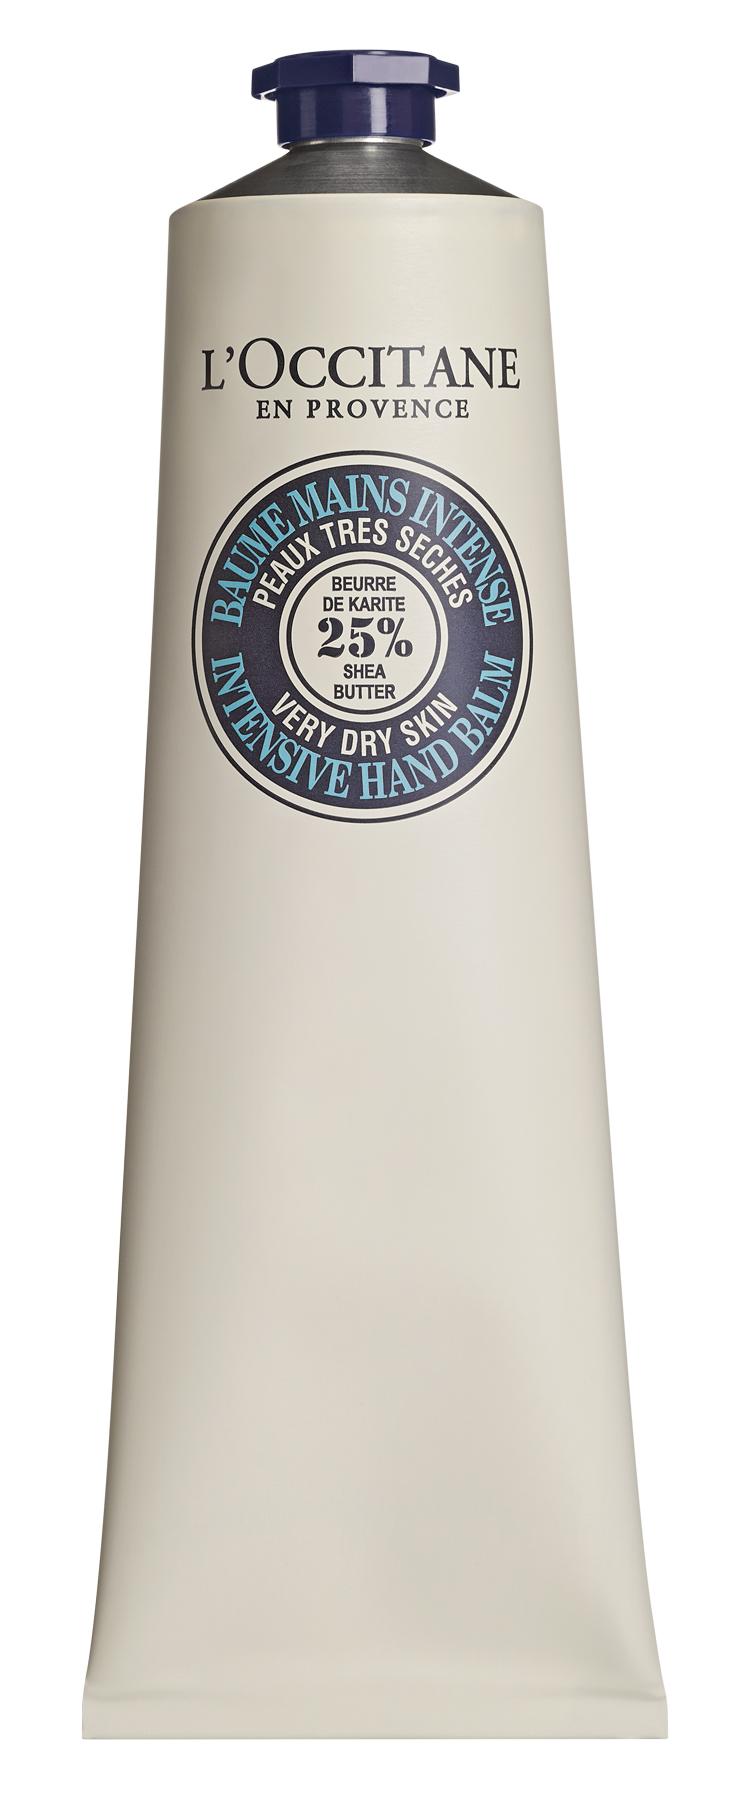 L'OCCITANE 乳油木密集修護手膜霜150ml /NT. 1,300